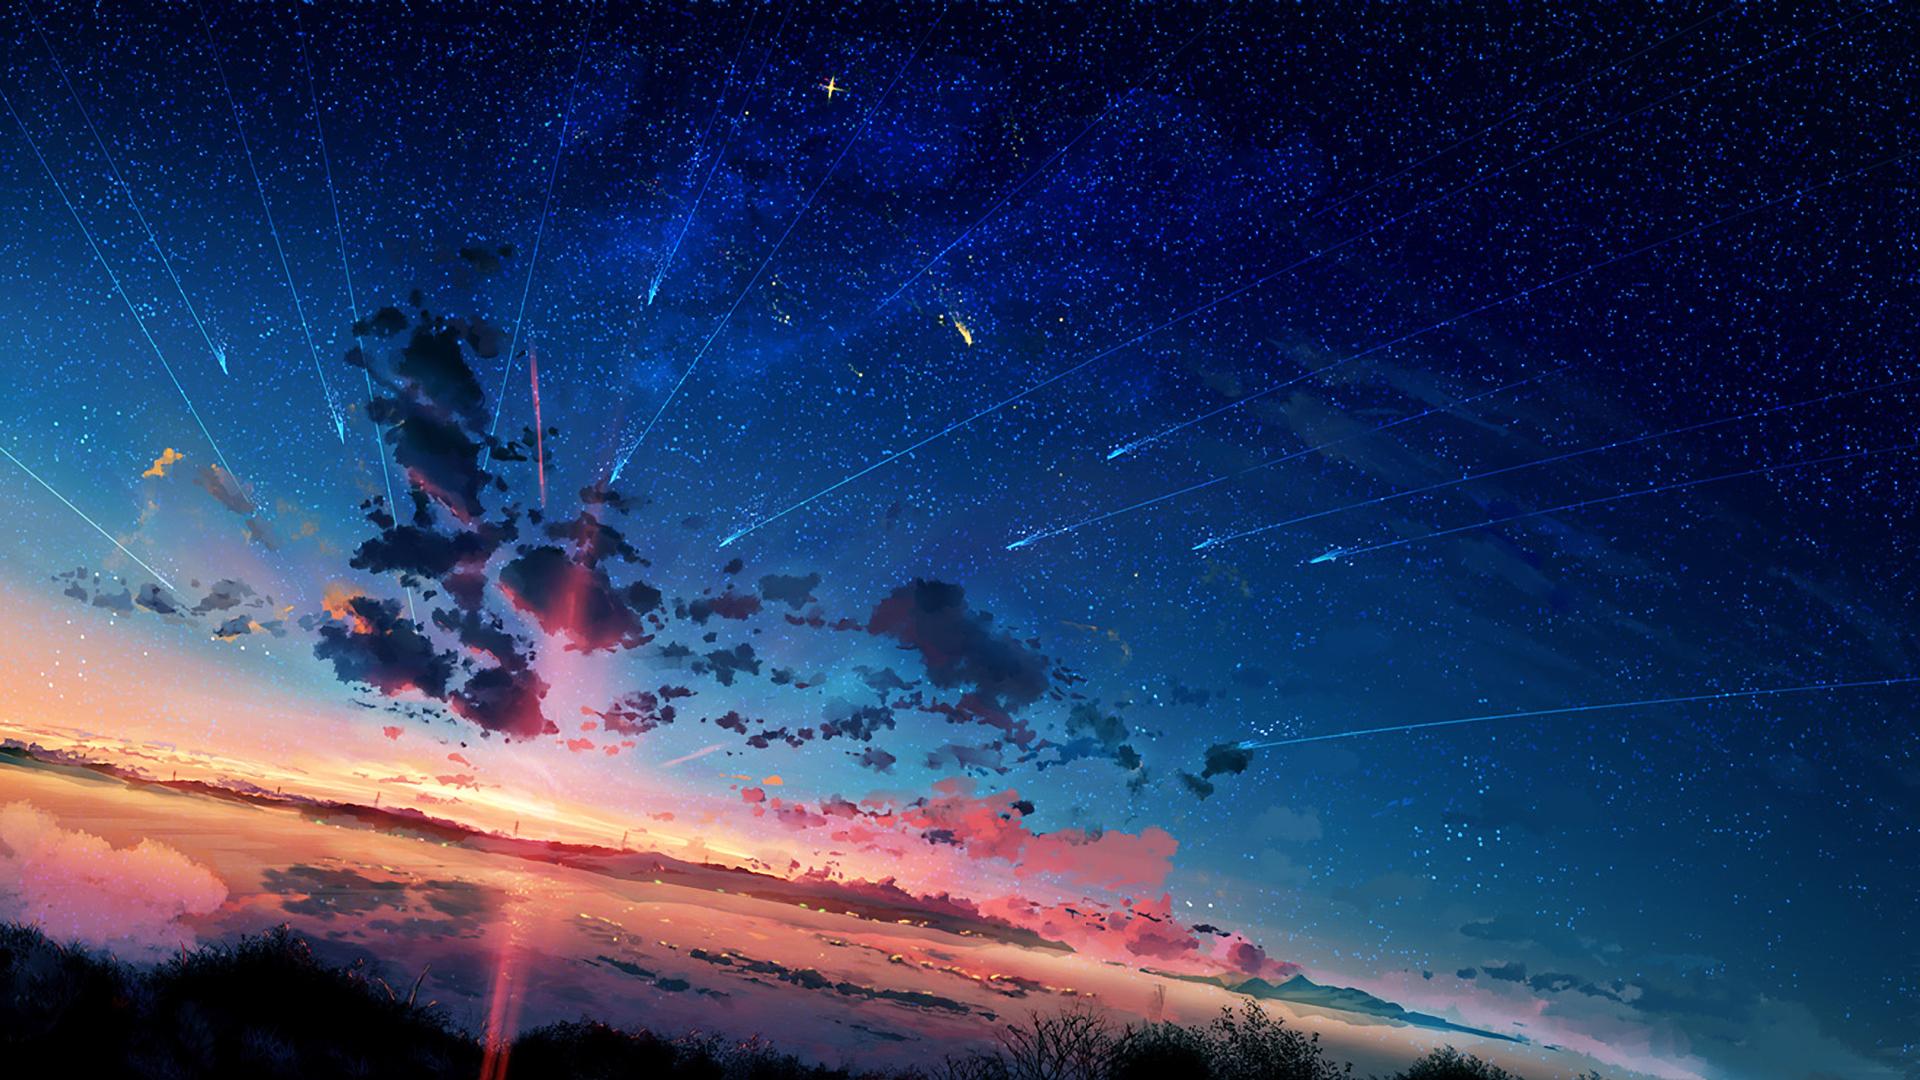 Anime 1920x1080 landscape sky anime